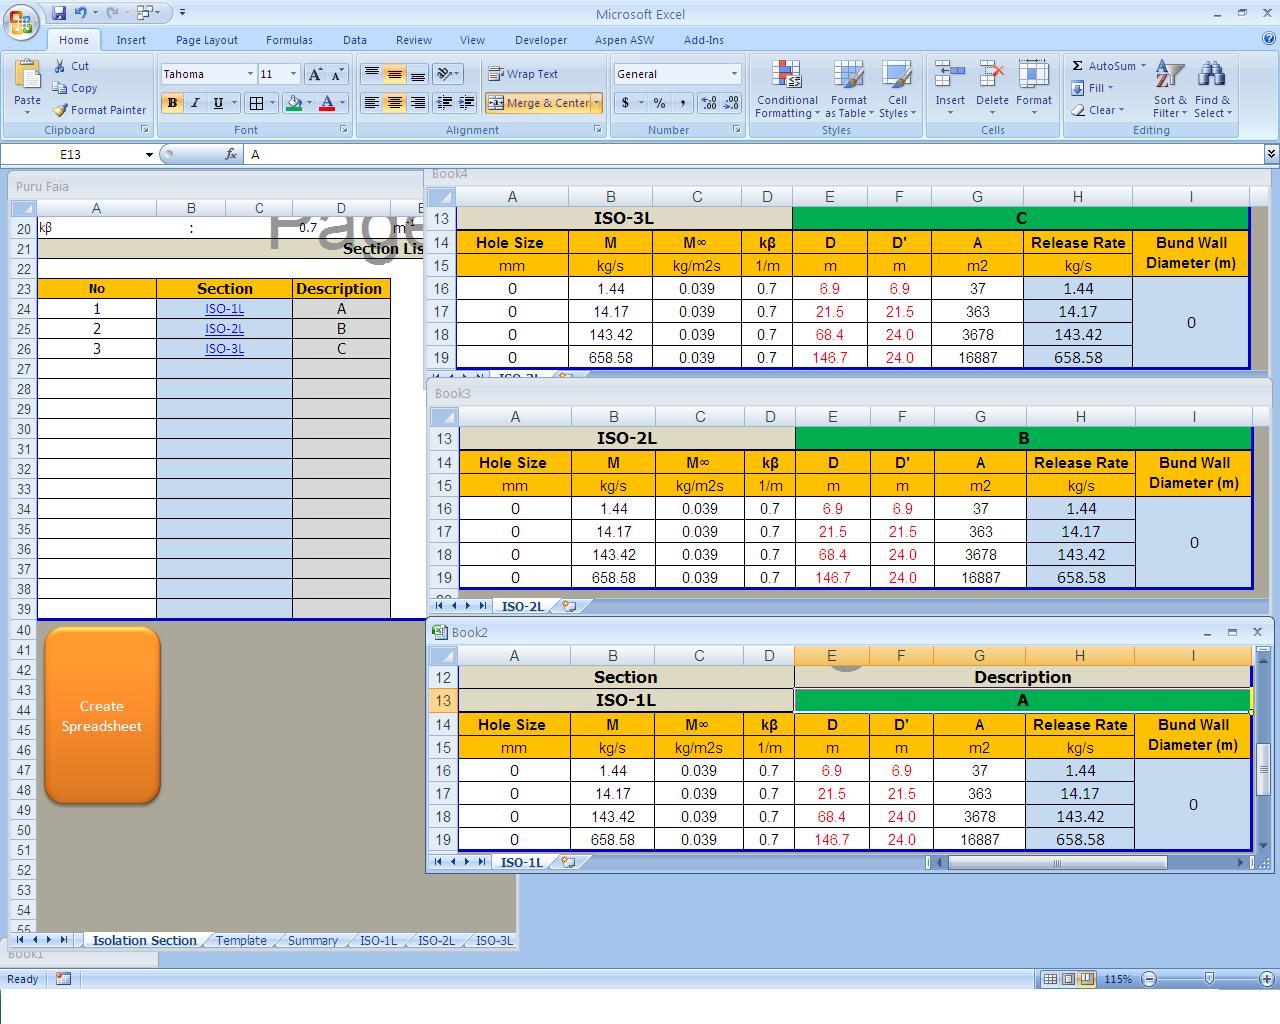 Samples Of Excel Vba Templates In Excel Vba Templates For Google Spreadsheet